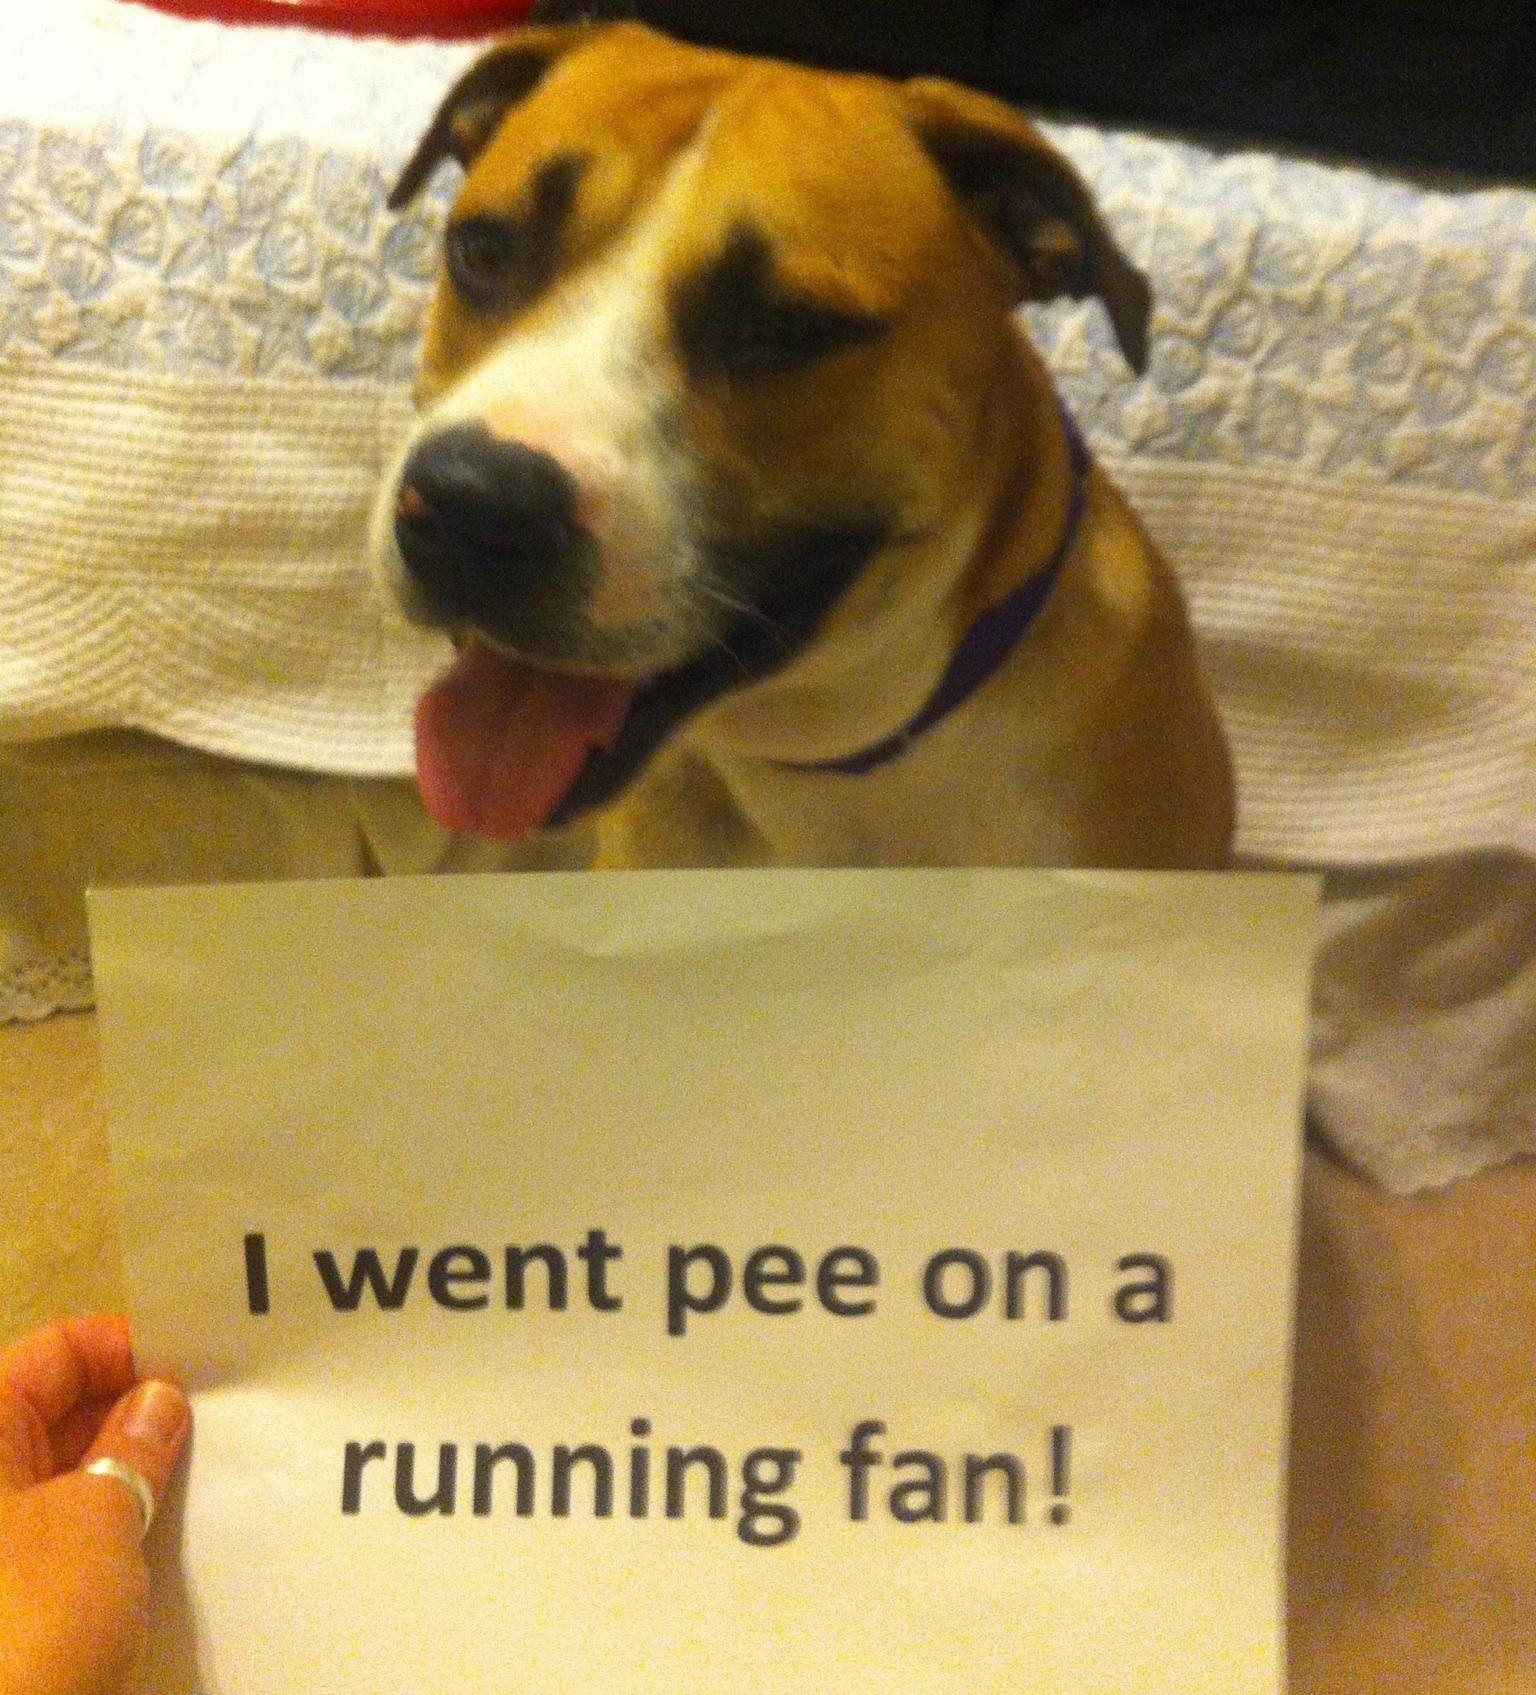 25 pictures of public dog shaming   Dogtime